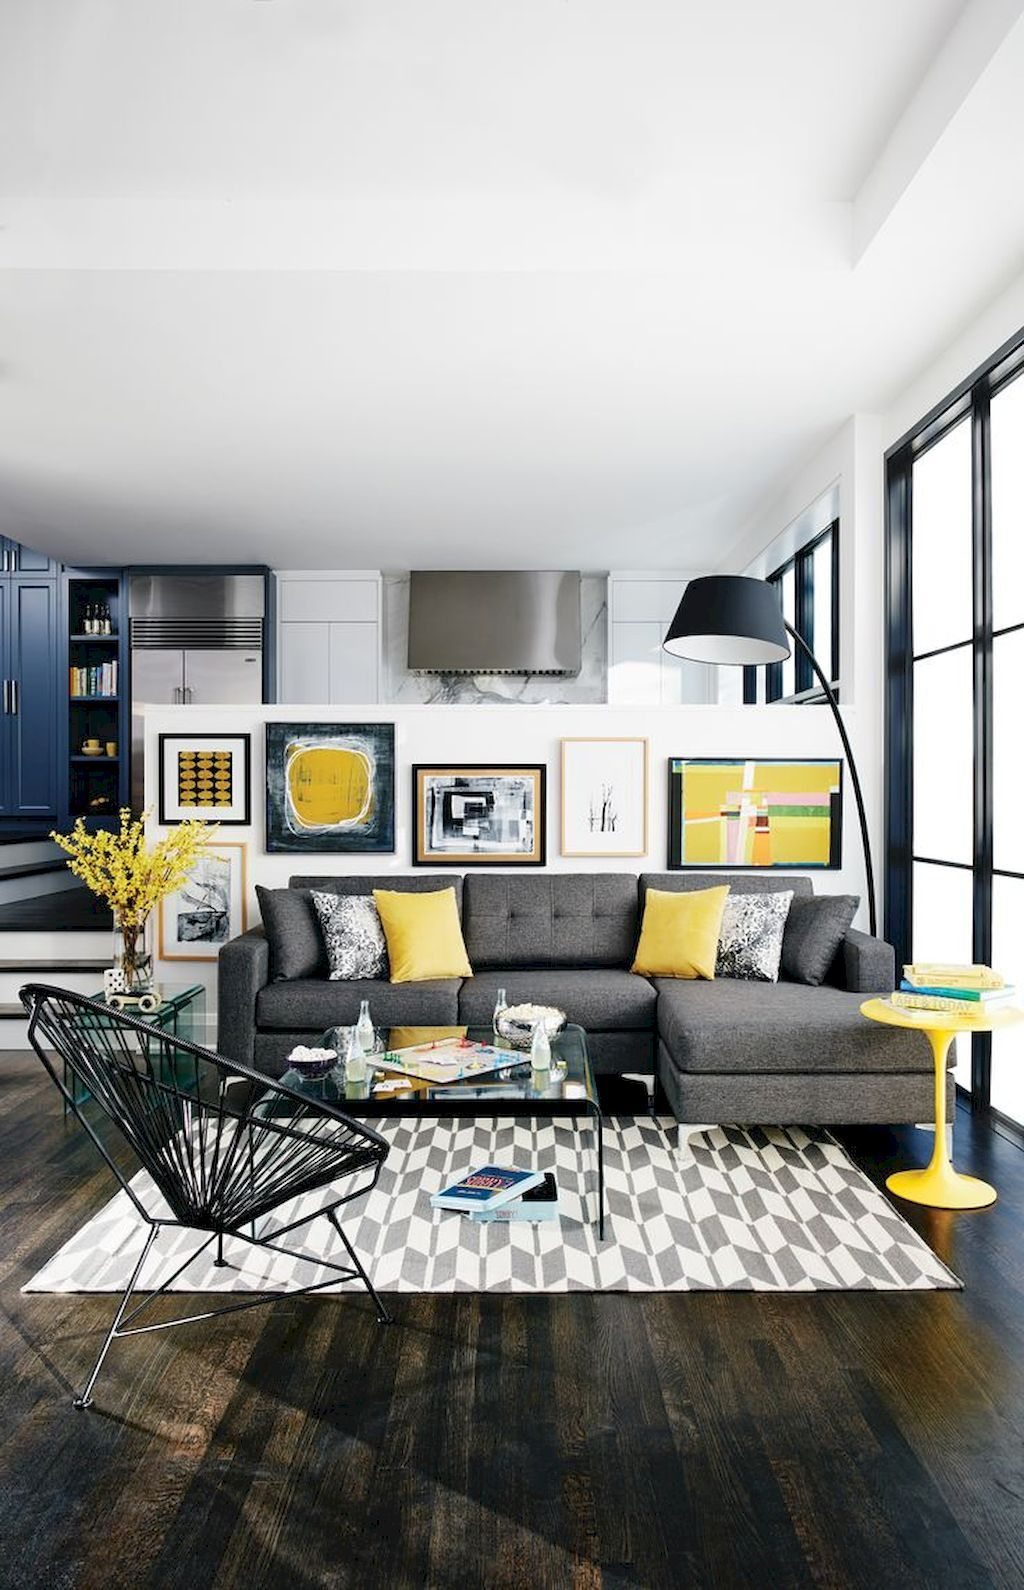 40+ Small Living Room Ideas Decoration | Living room ideas, Small ...